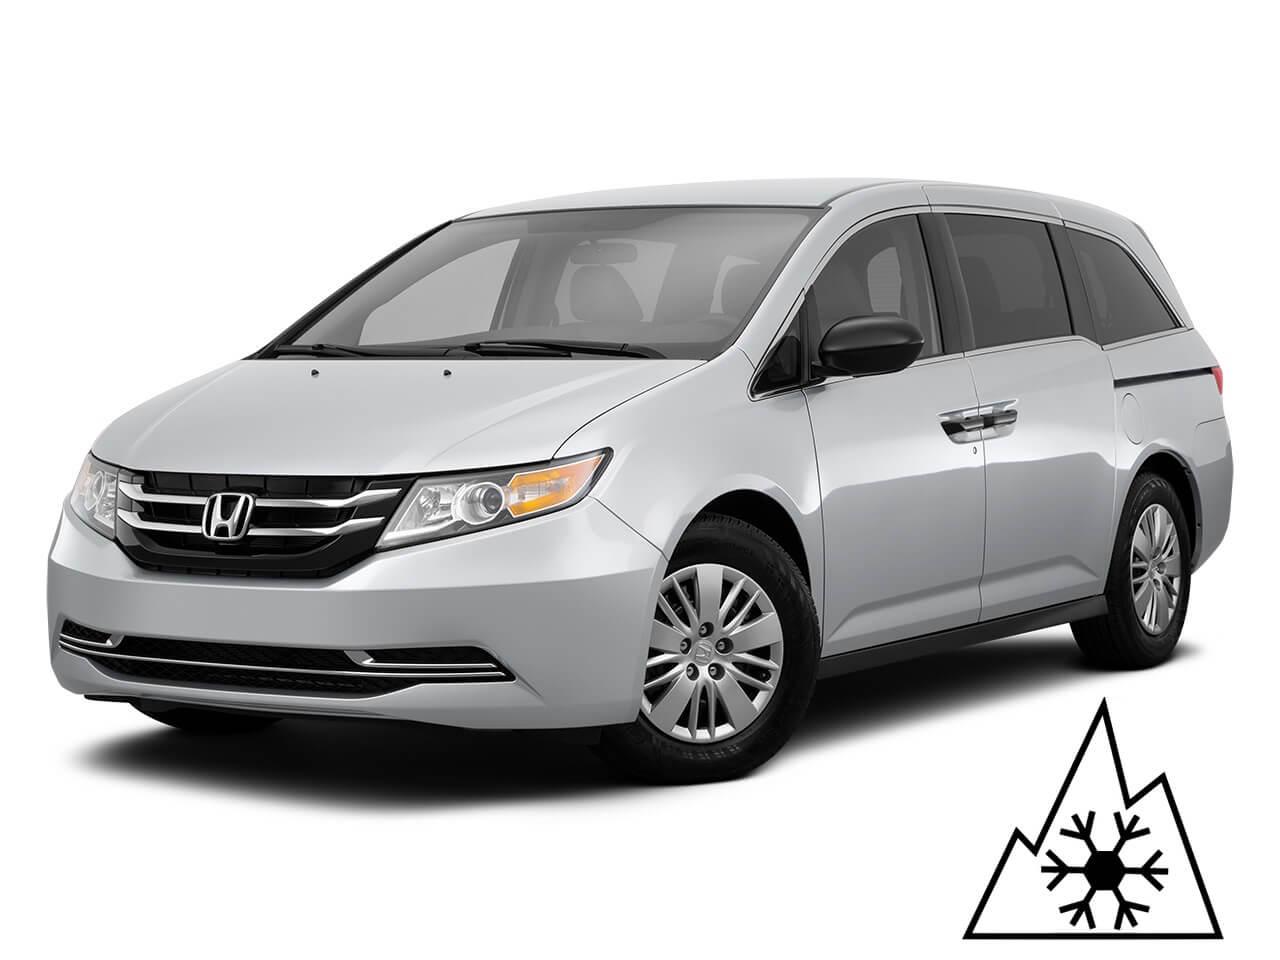 Car Rental Vancouver - Chevrolet Sonic